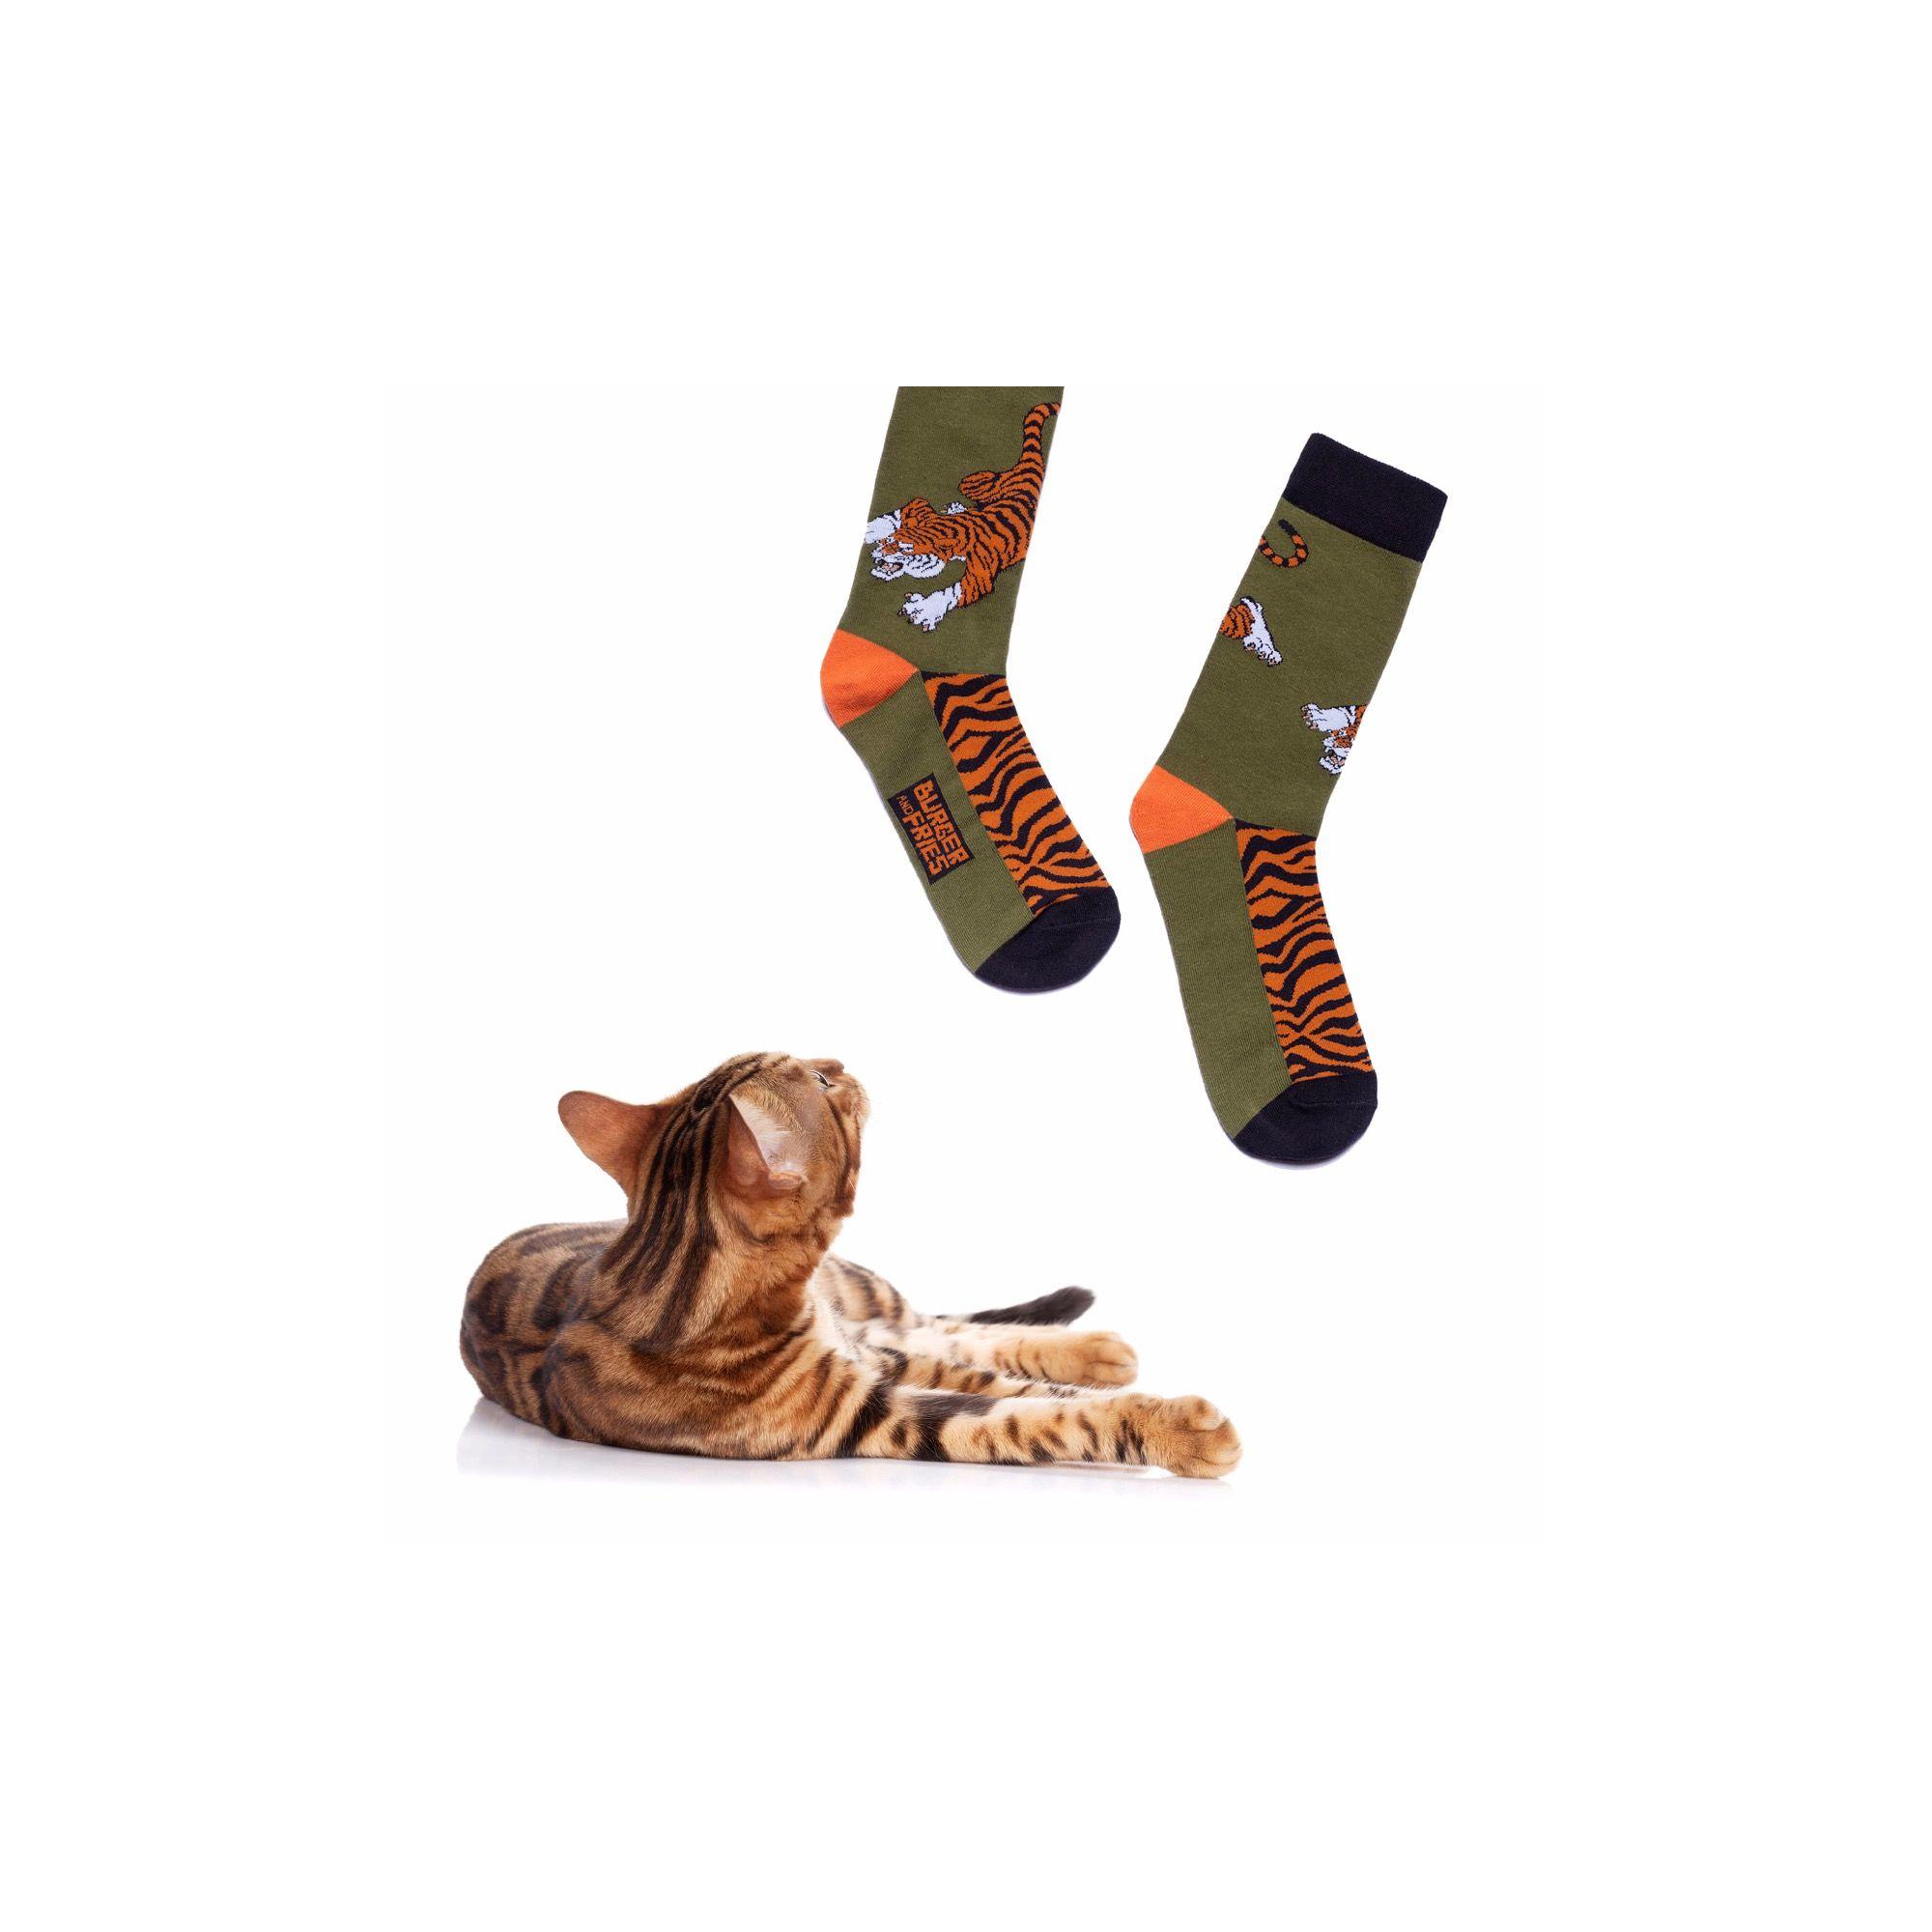 BIG ANIMAL SOCKS EYES OF THE TIGER